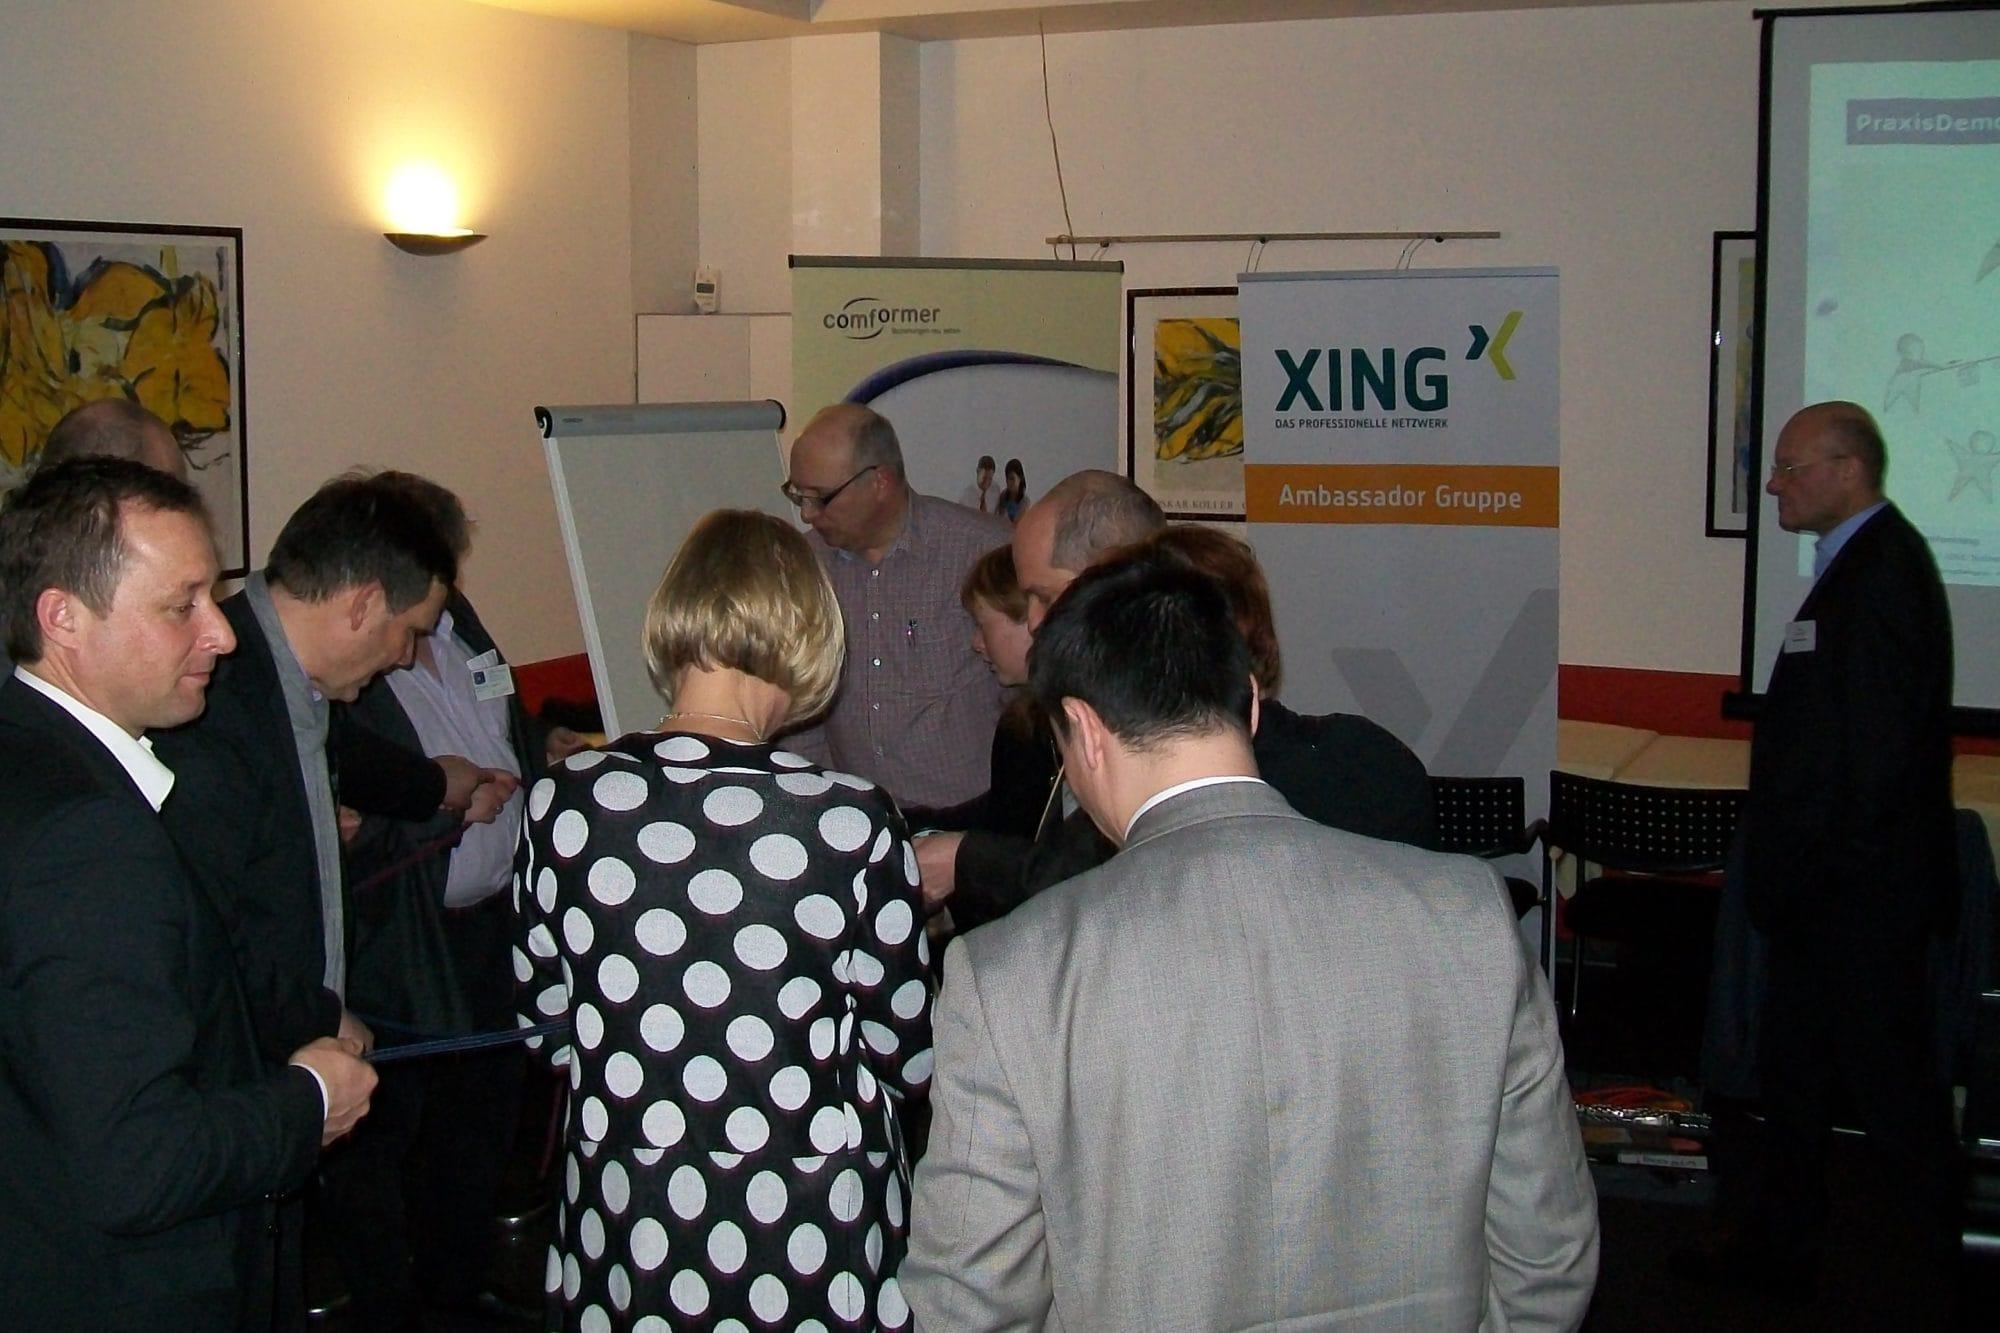 comforming Live-Demo zu Team-Koordination bei der XING-Ambassador Gruppe Nürnberg